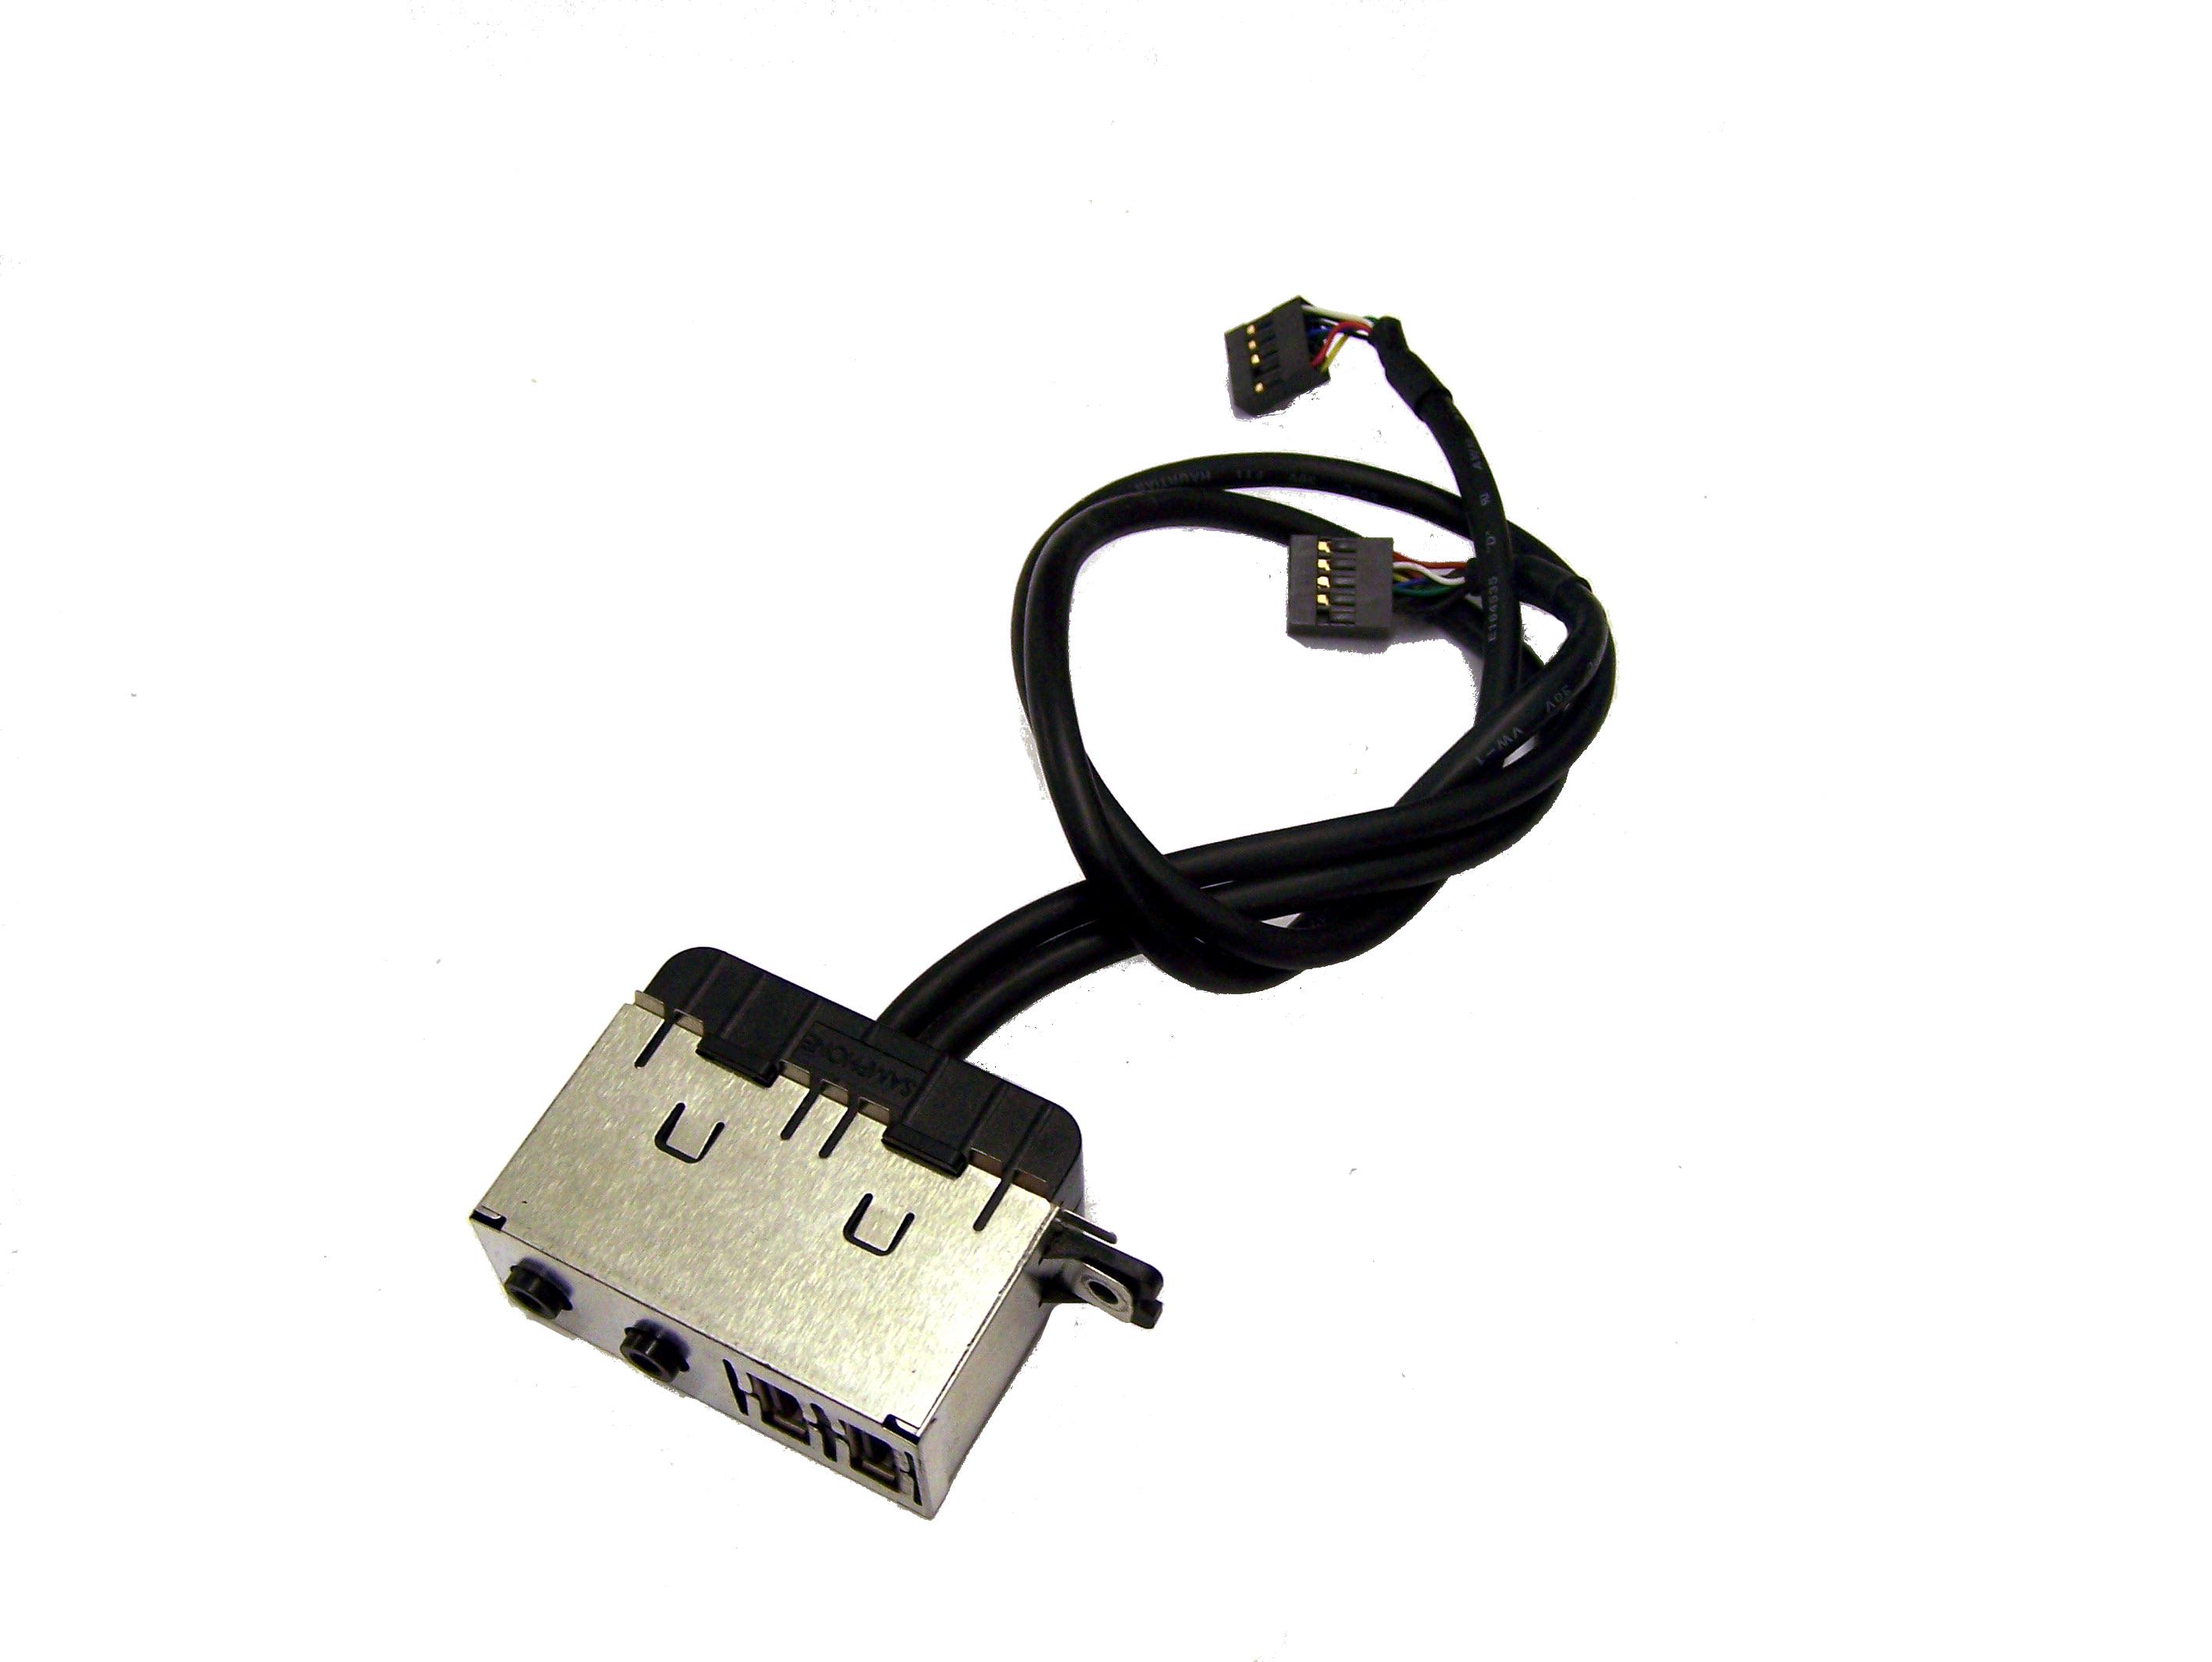 HL-DT-ST DVDRAM GSA-4165B Driver